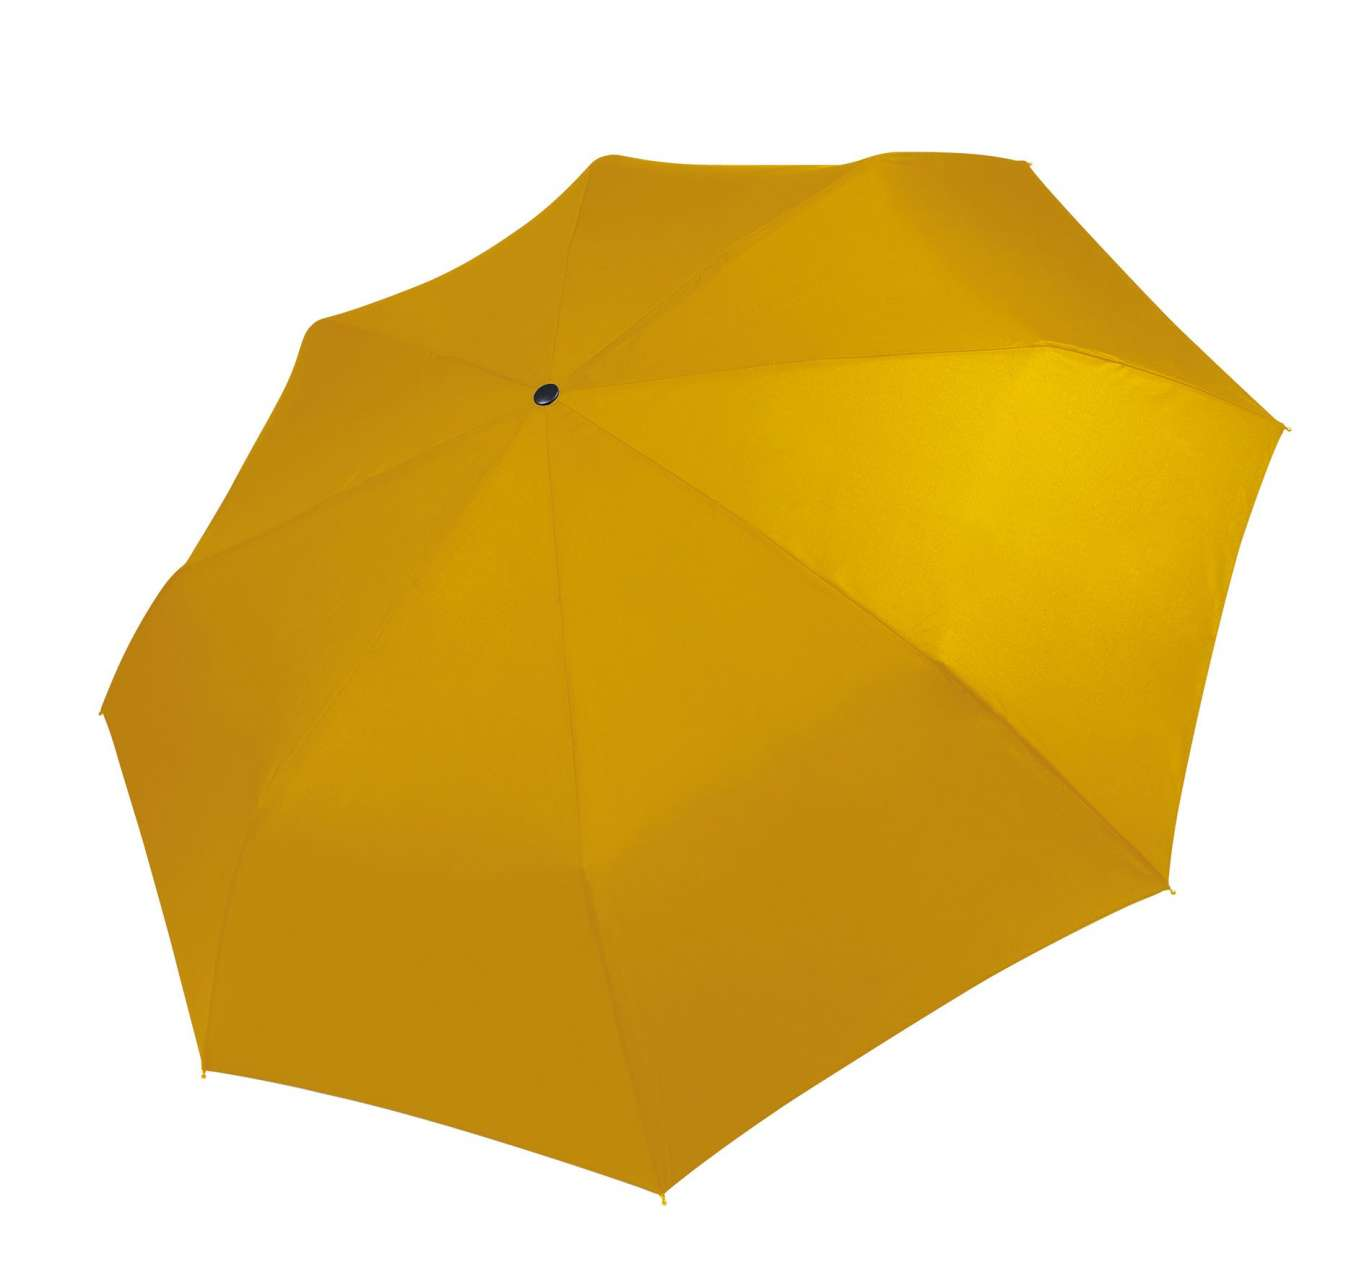 https://www.tovedo.hr/uploads/gallery/2019/09/ki2010-true_yellow-a1.jpg